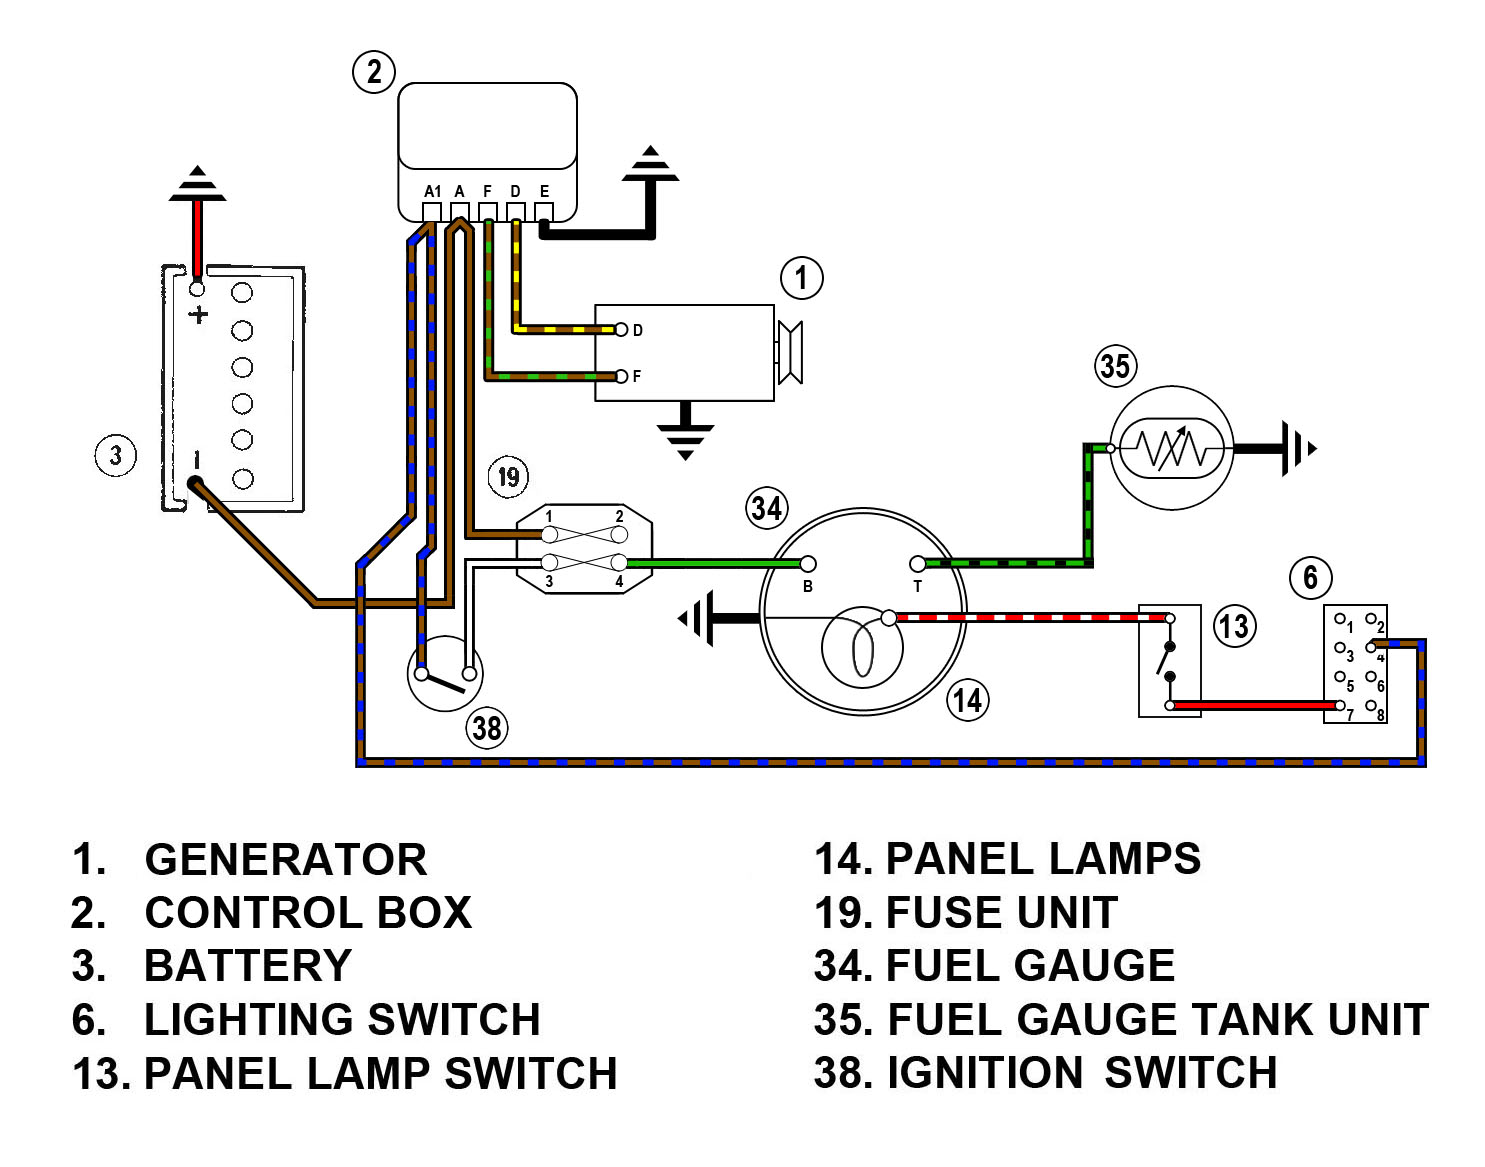 1994 Dodge Dakota Ignition Wiring Diagram